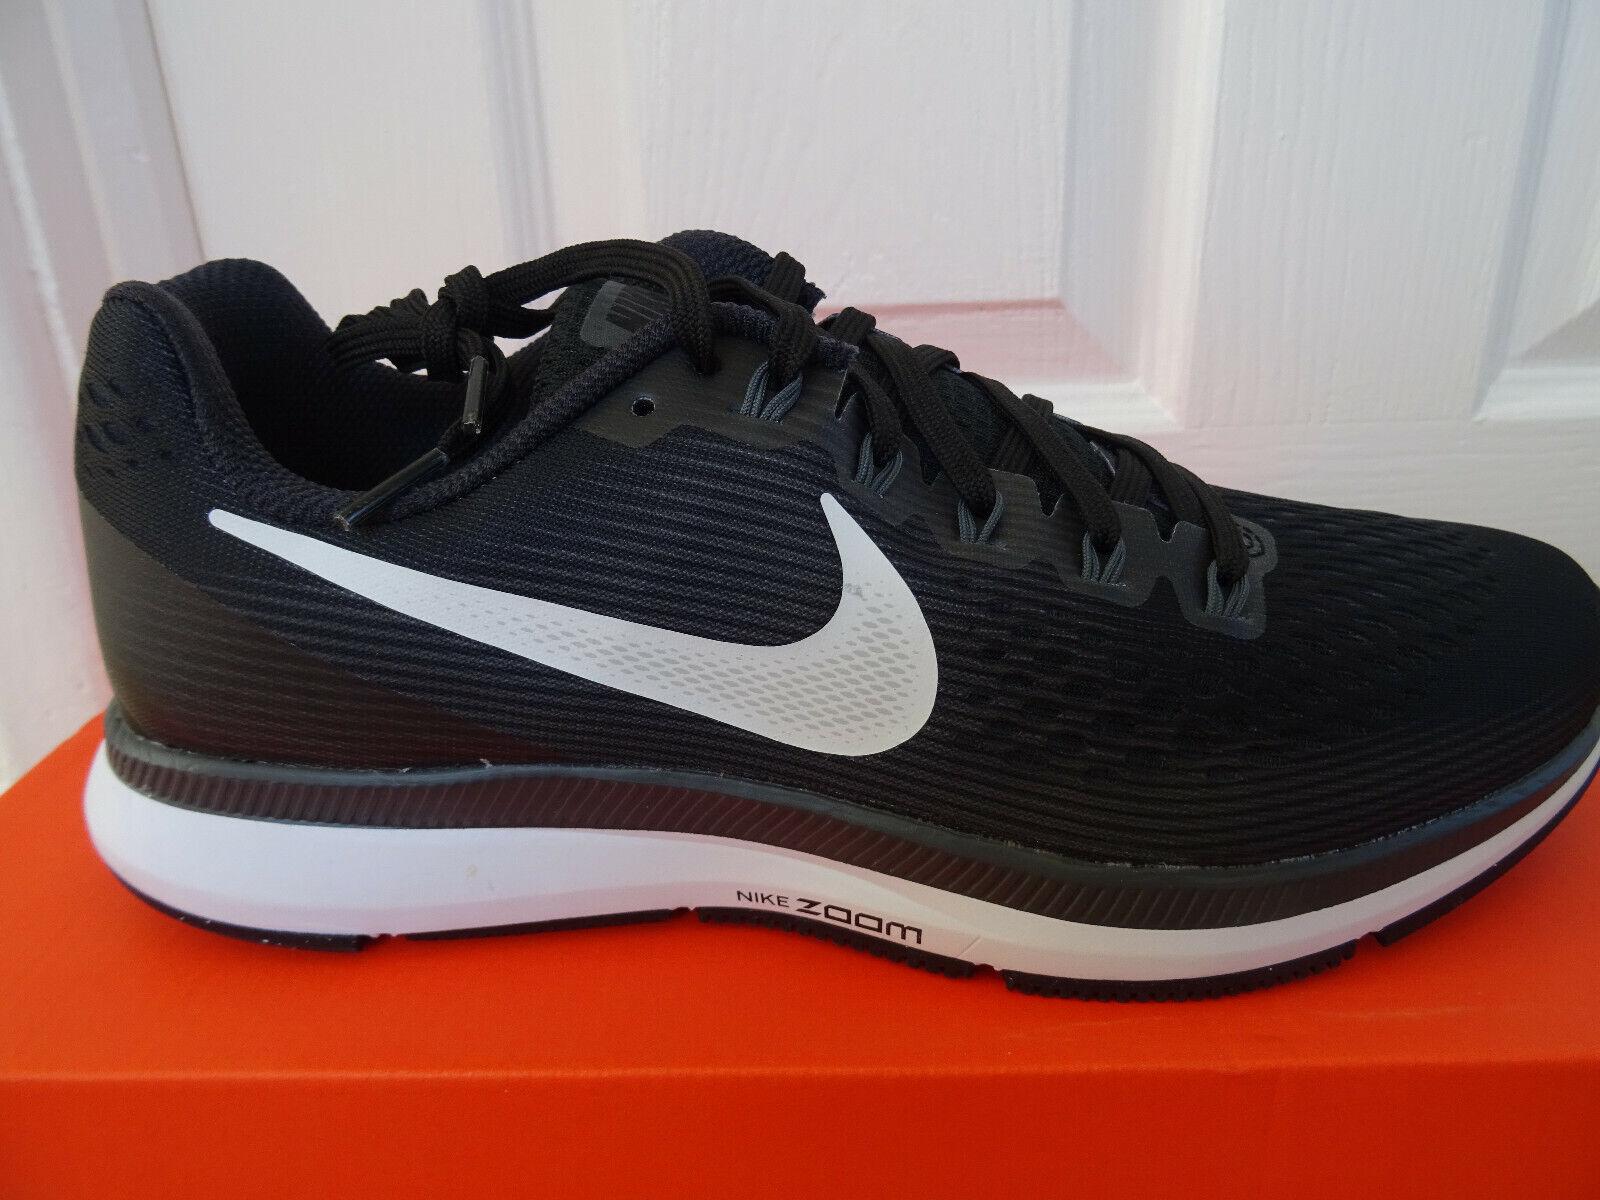 Nike Air Zoom pegasus 34 womens trainers 880560 001 uk 8 eu 42.5 us 10.5 NEW+BOX